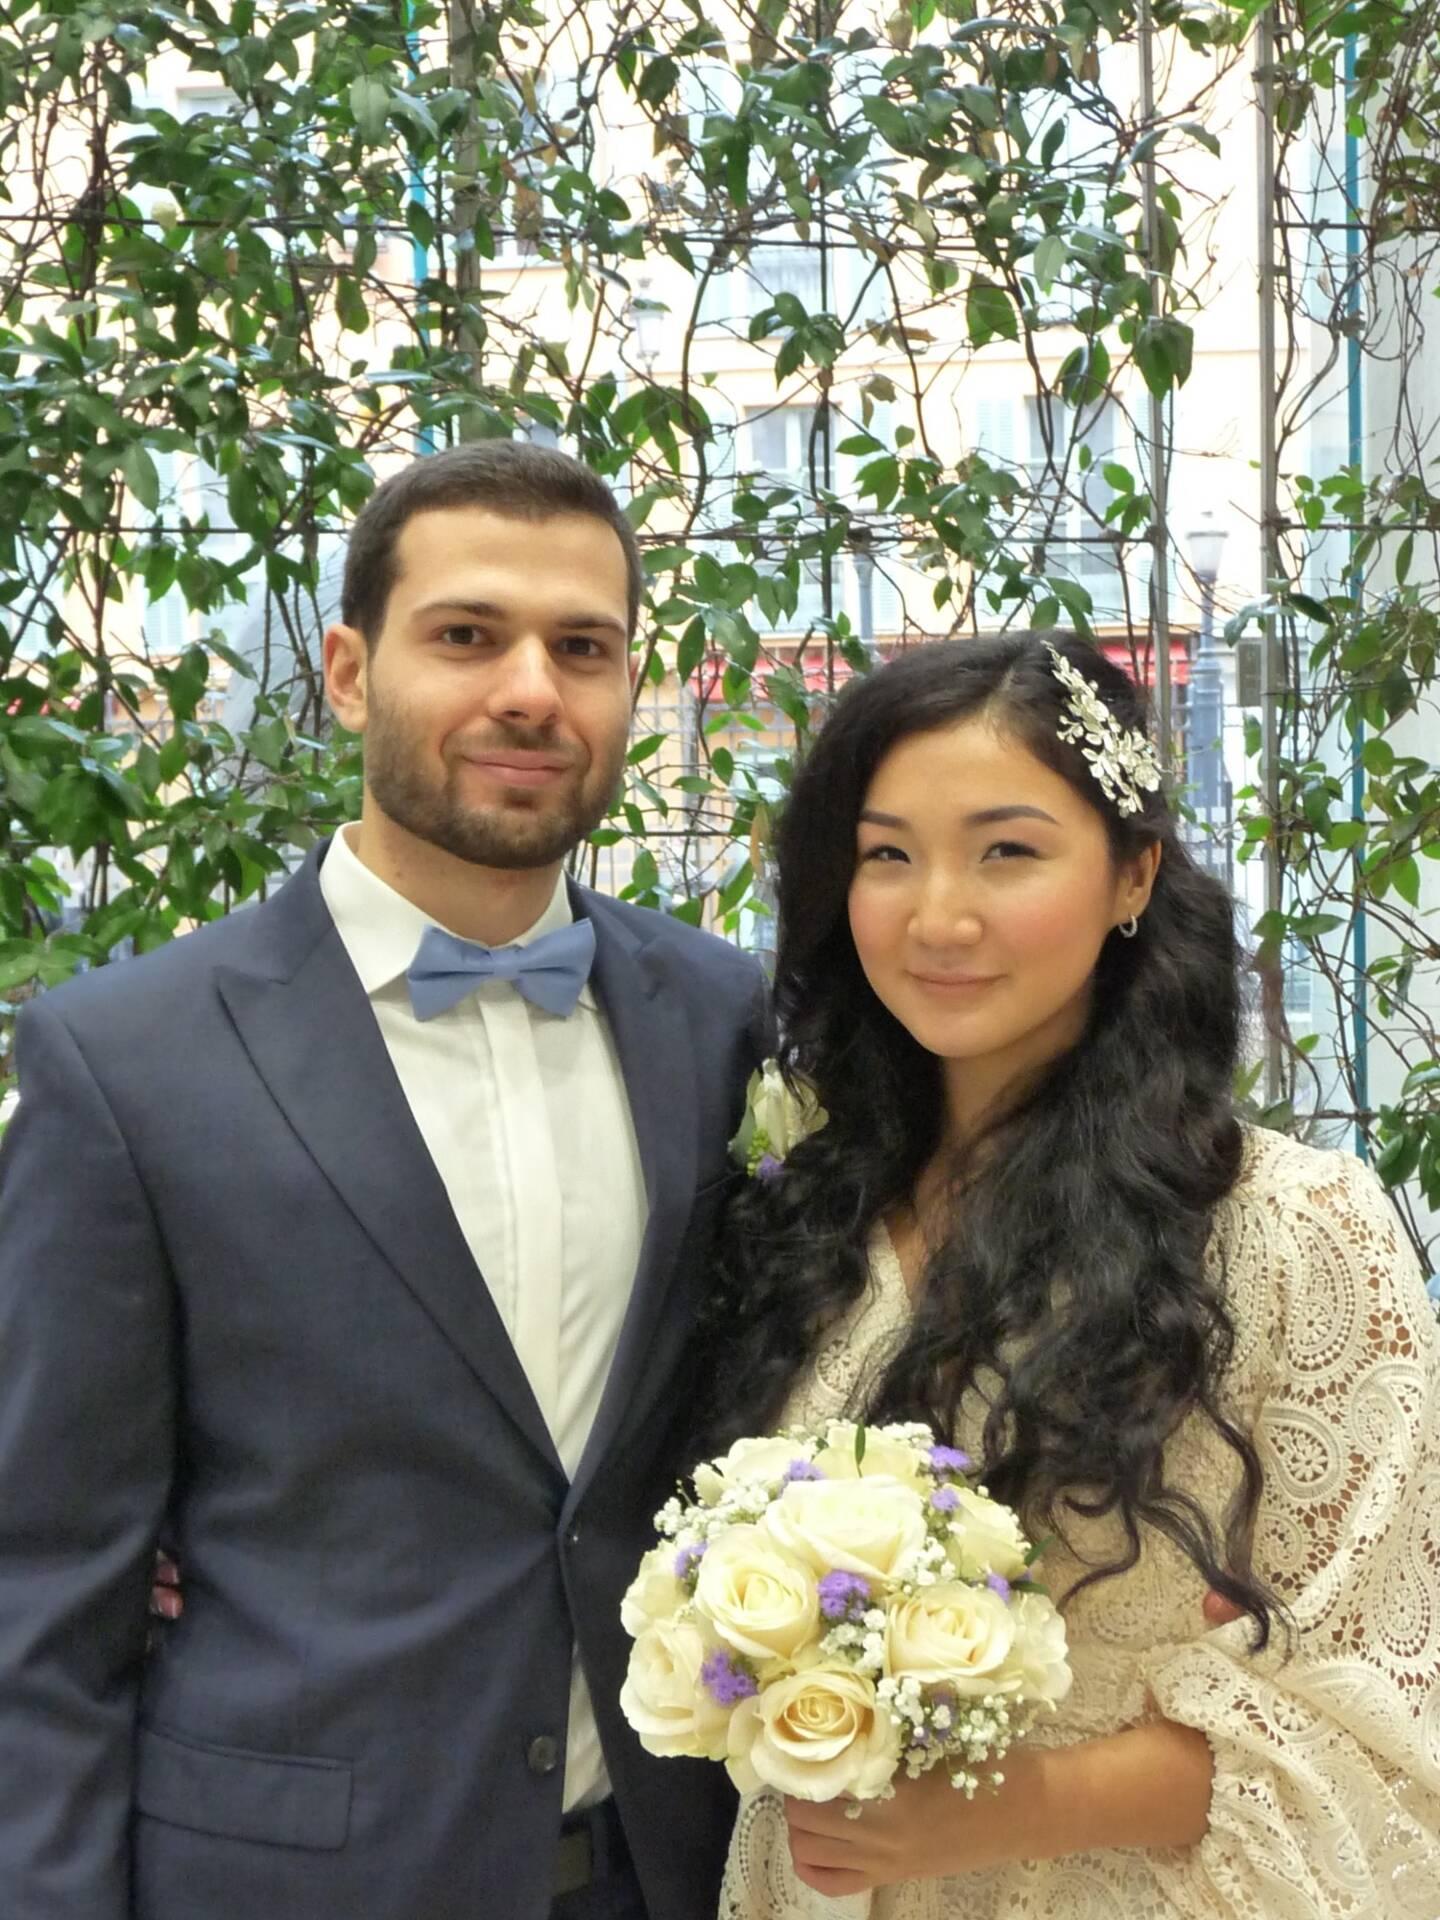 Caelin Kaplan, doctorant en informatique, et Azhar Kaukerbekova, étudiante.